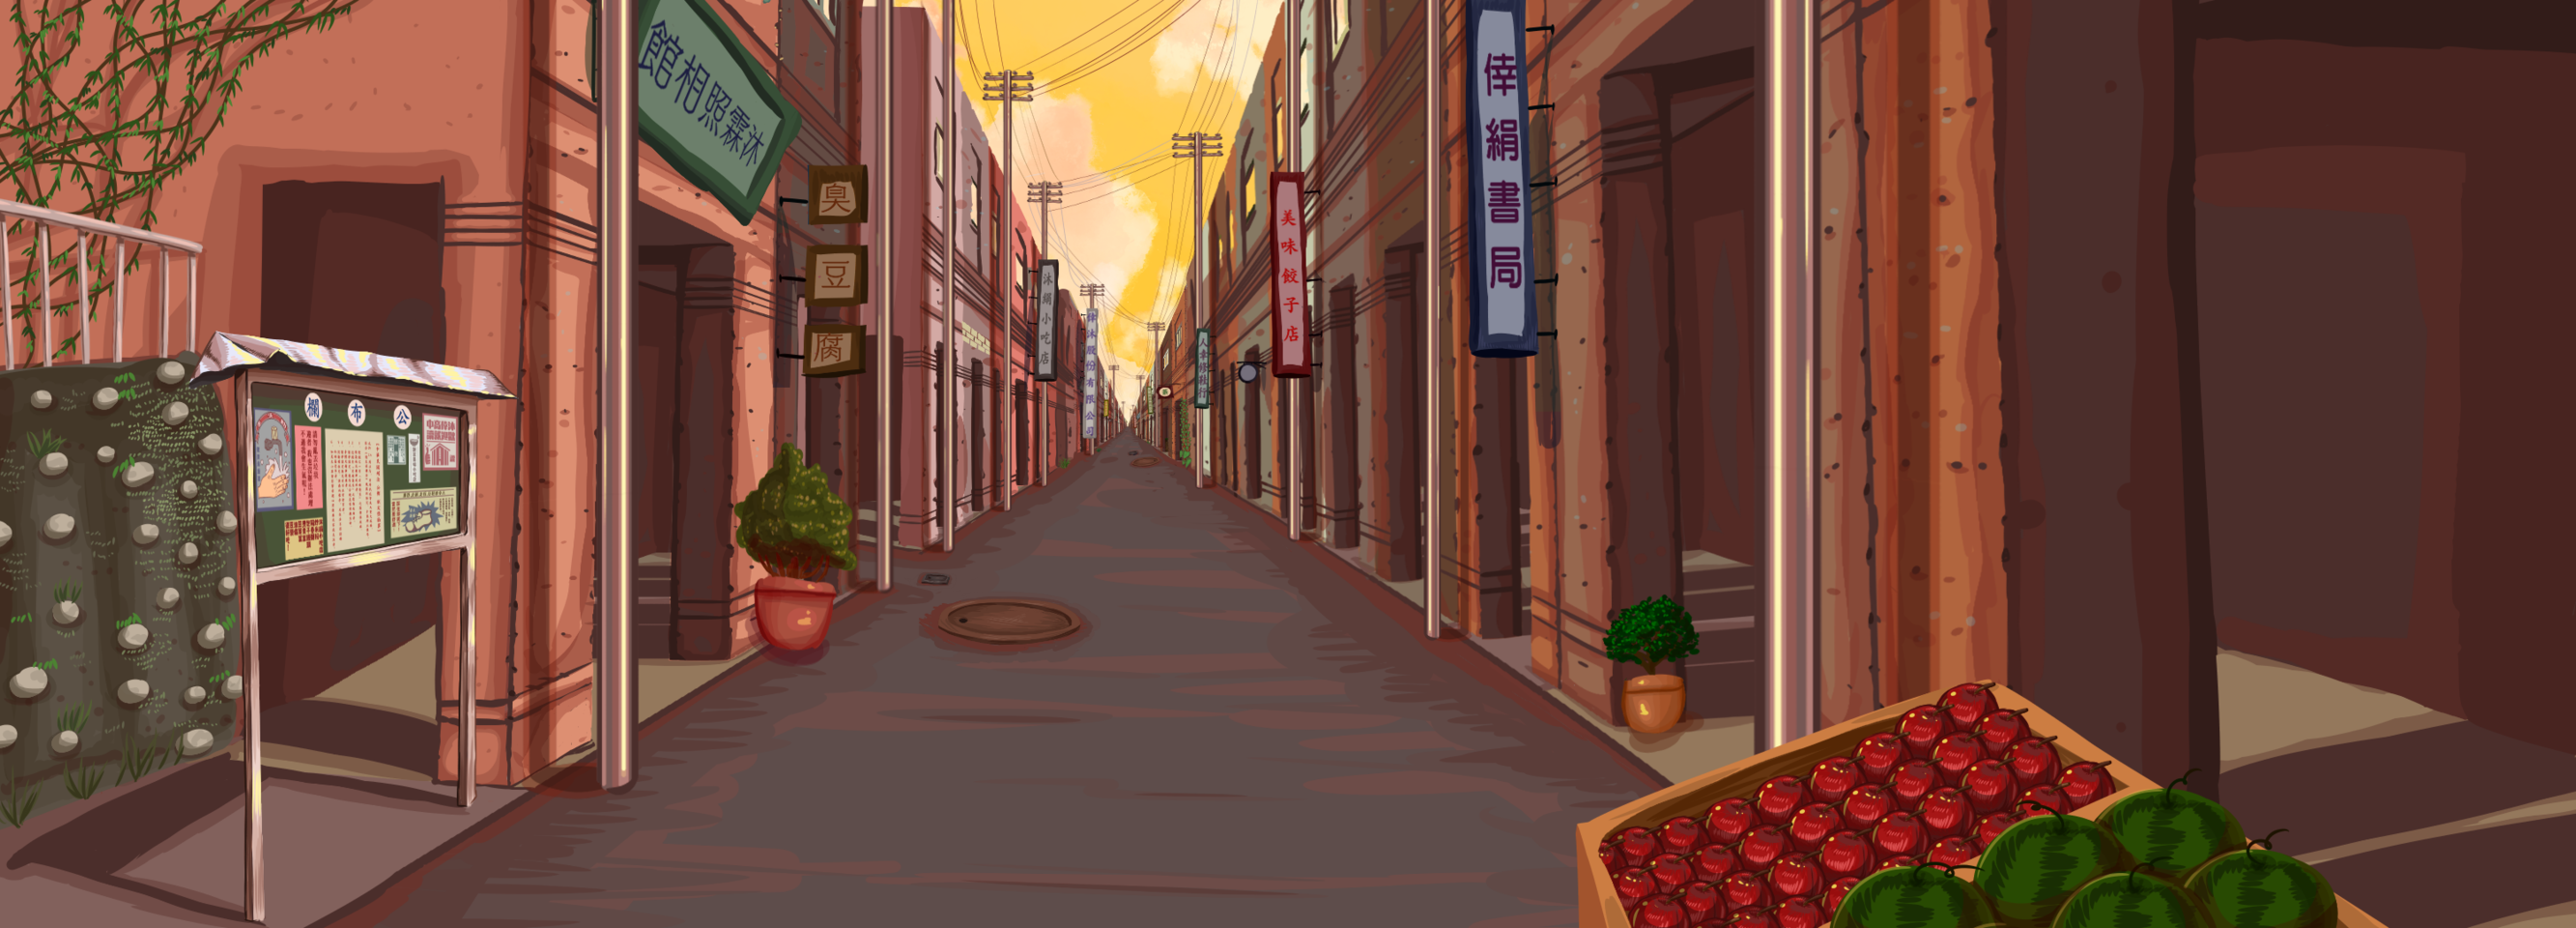 懷舊街景2 Illust of 派CP ARTstreet_Ranking medibangpaint